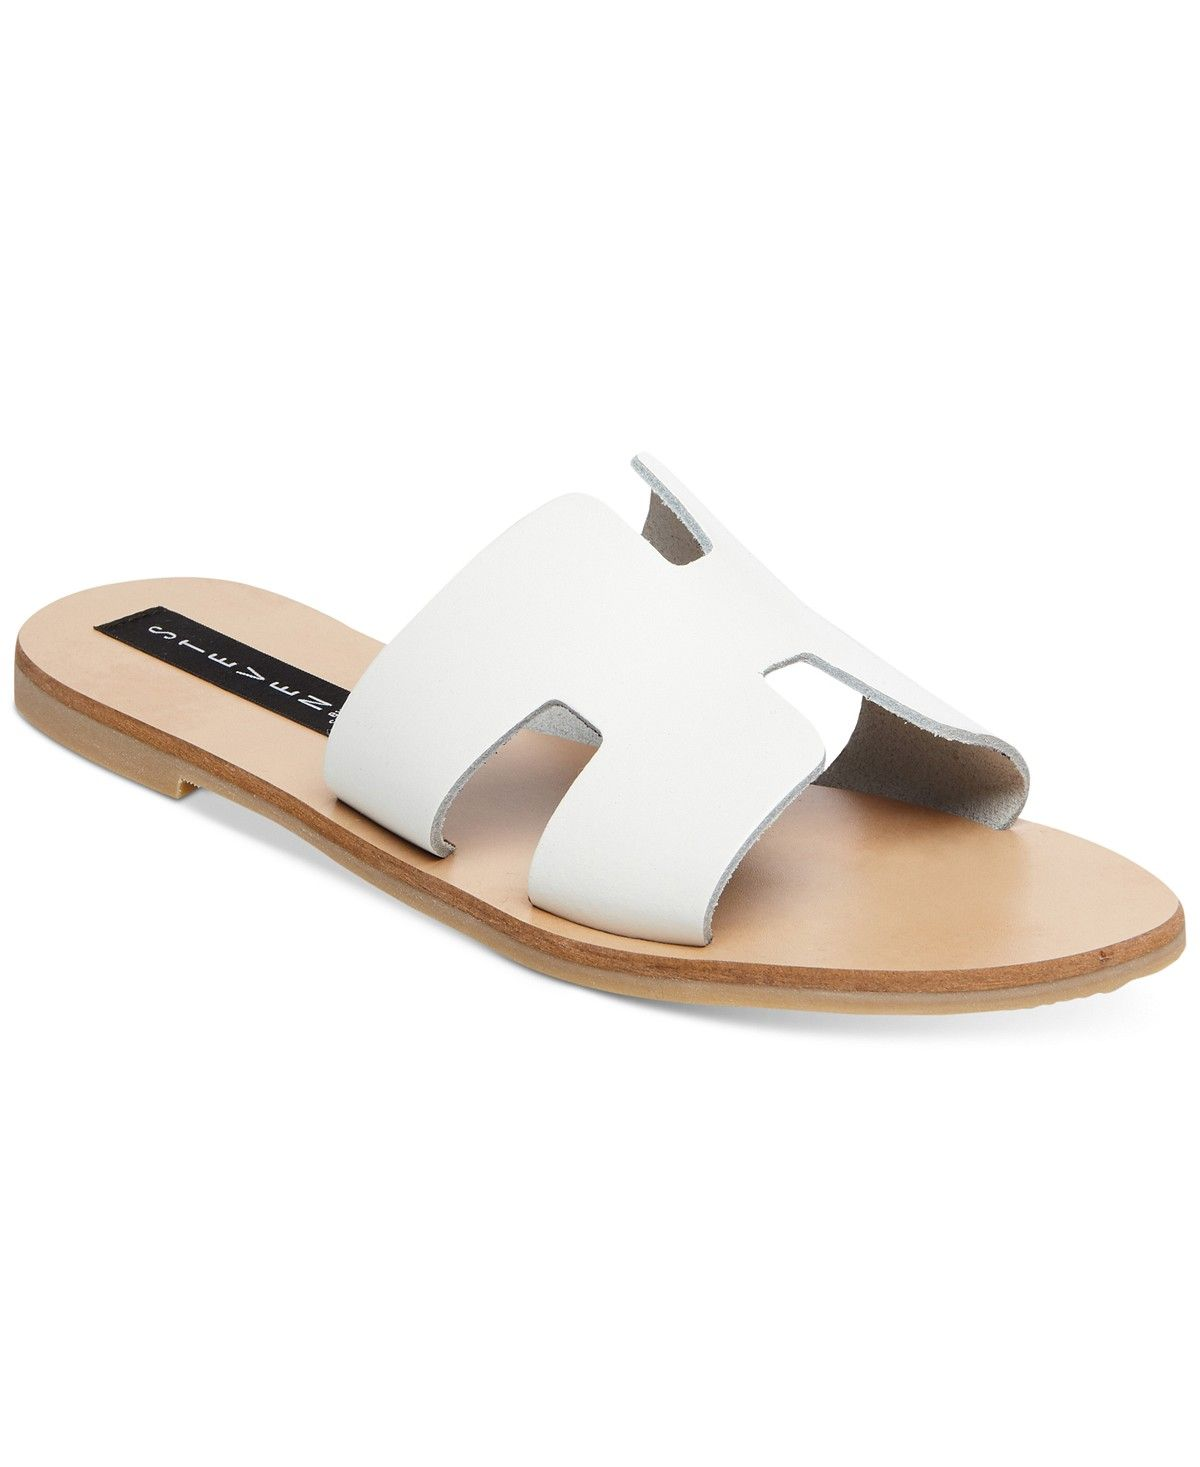 f5c389fcb05 STEVEN by Steve Madden Women s Greece Sandals - Sandals - Shoes - Macy s